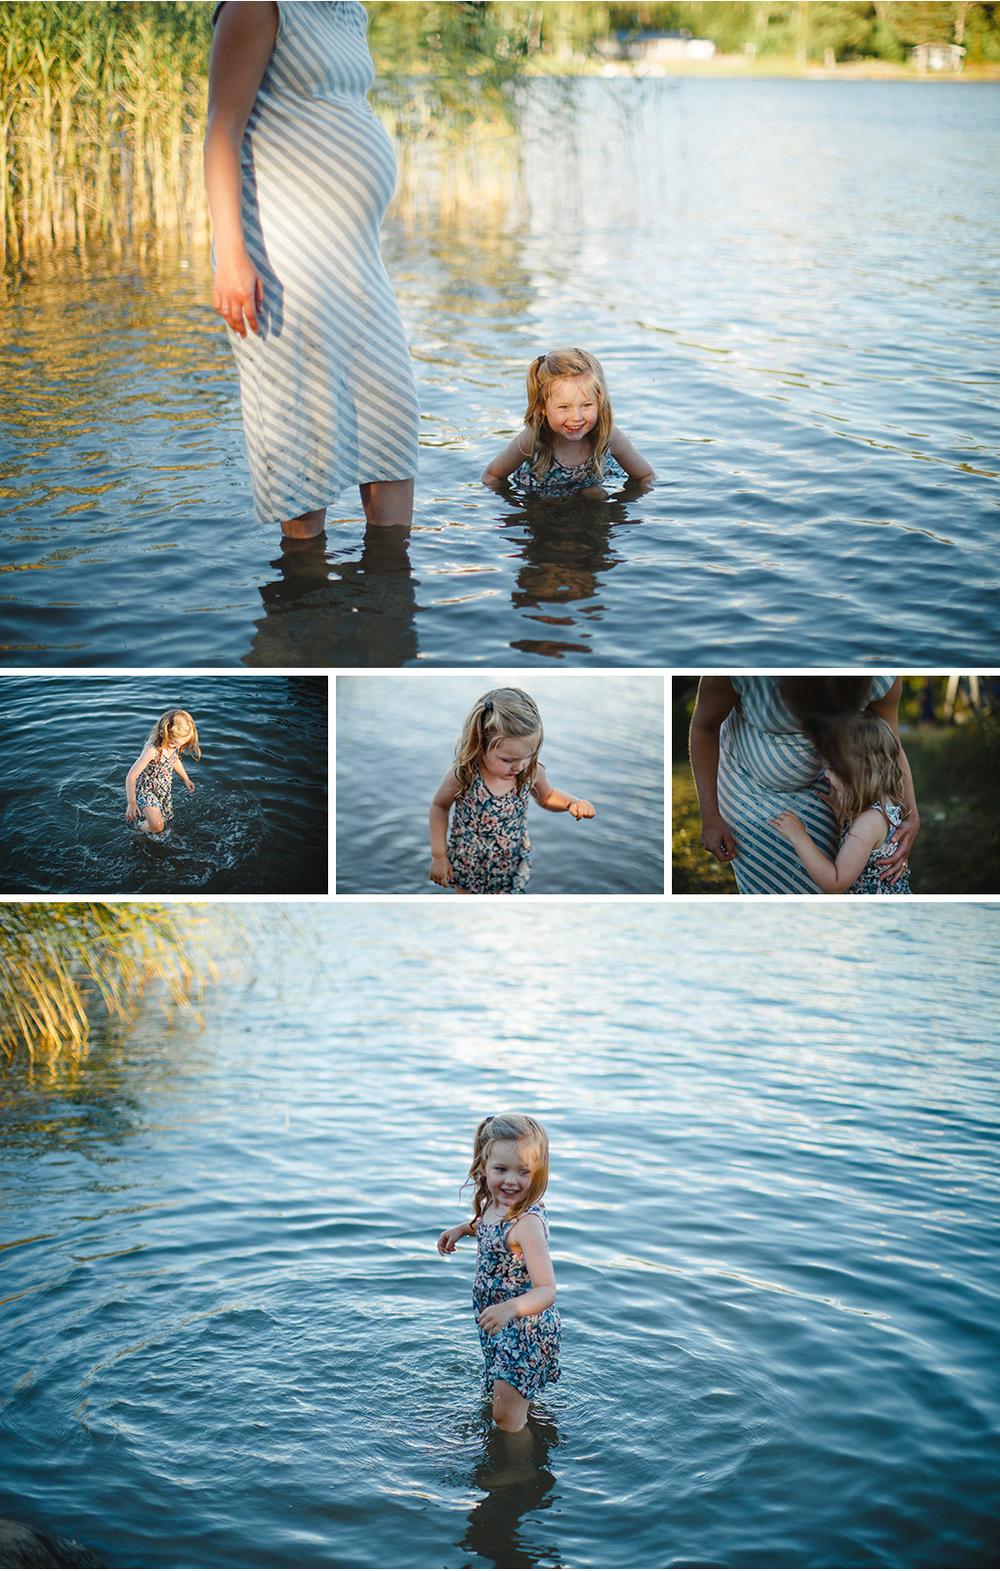 Lifestyle-familjefotografering_Familjefotograf-Anna-Sandstrom-11.jpg